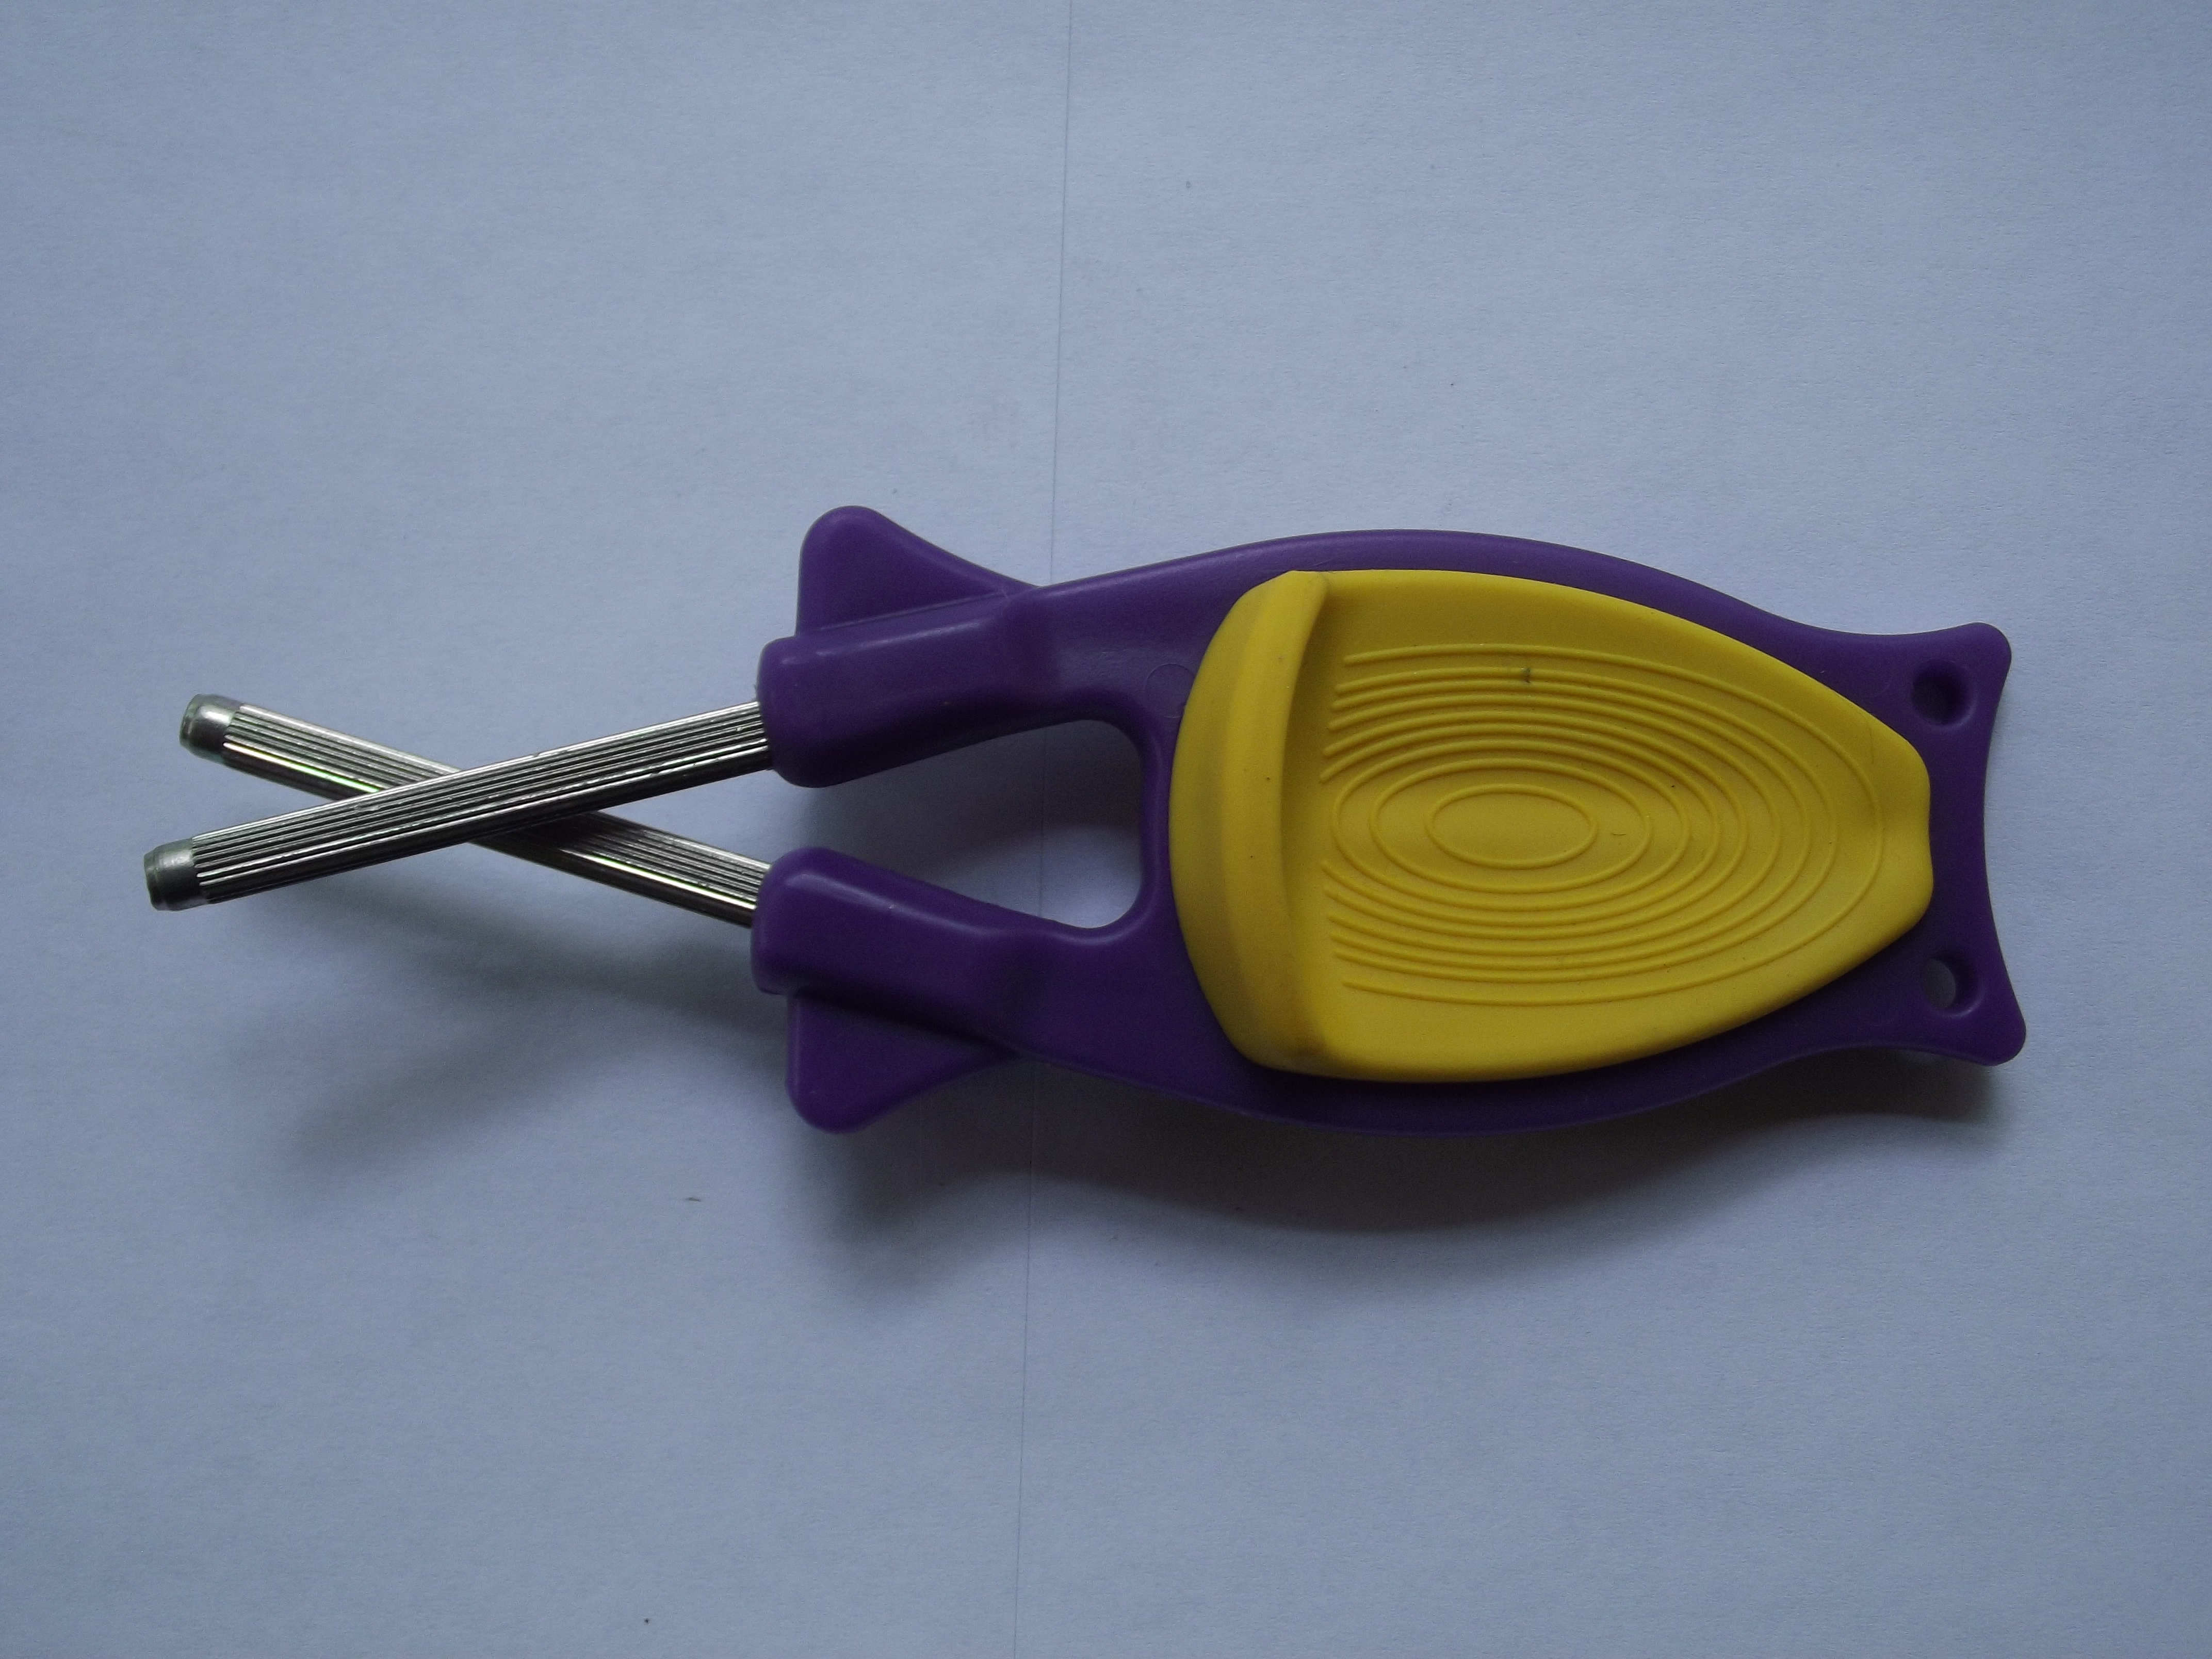 block sharpener with purple handle and yellow grip